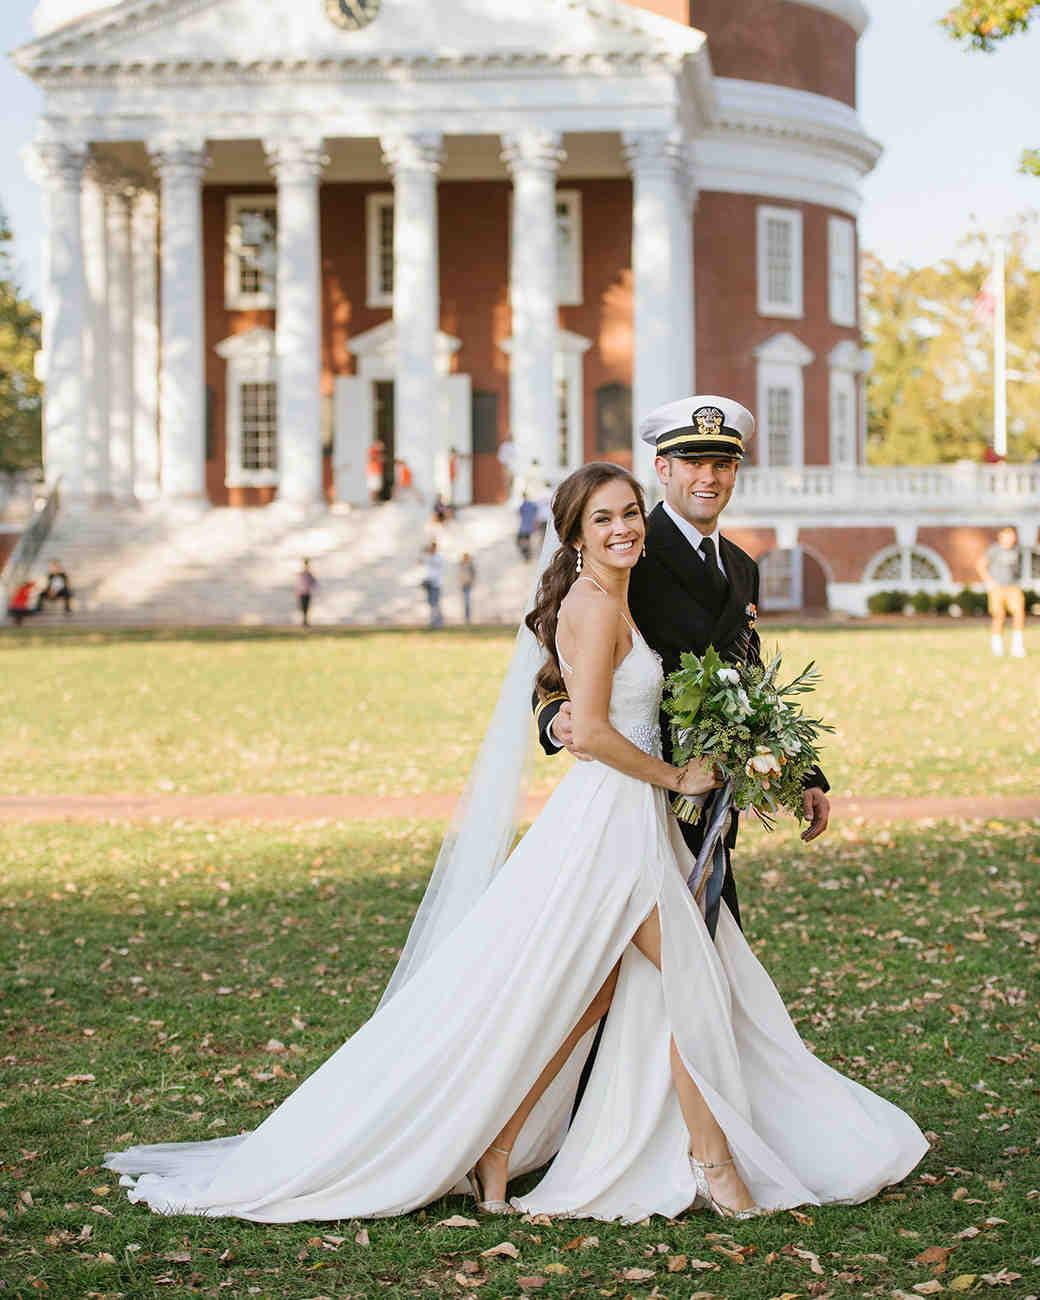 anne and staton wedding portrait outside venue